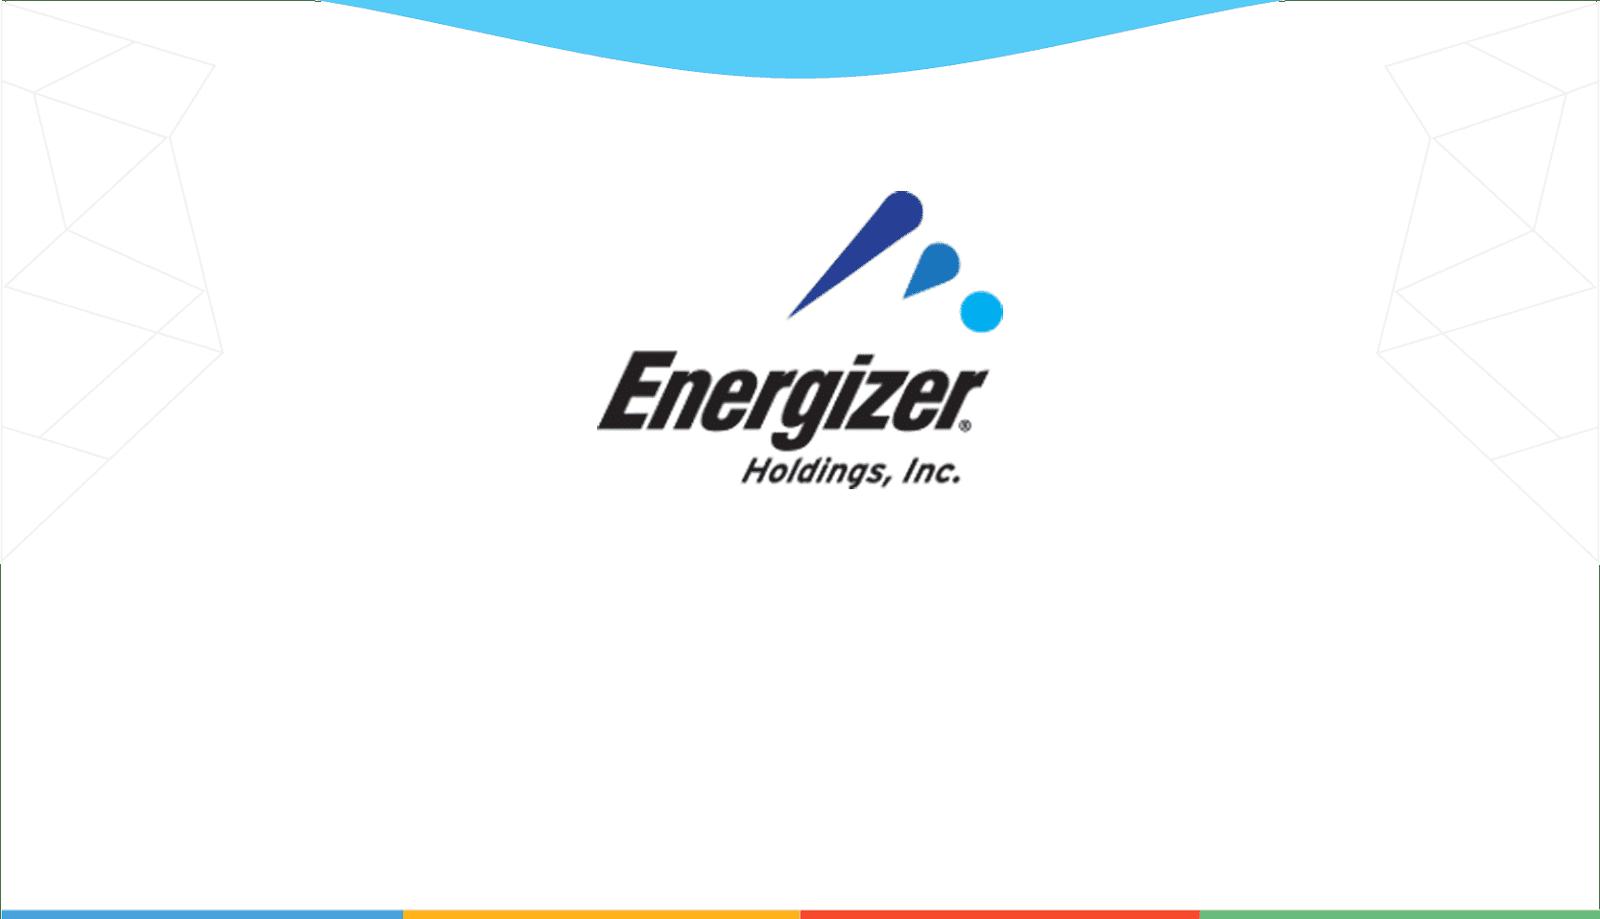 energizer careers